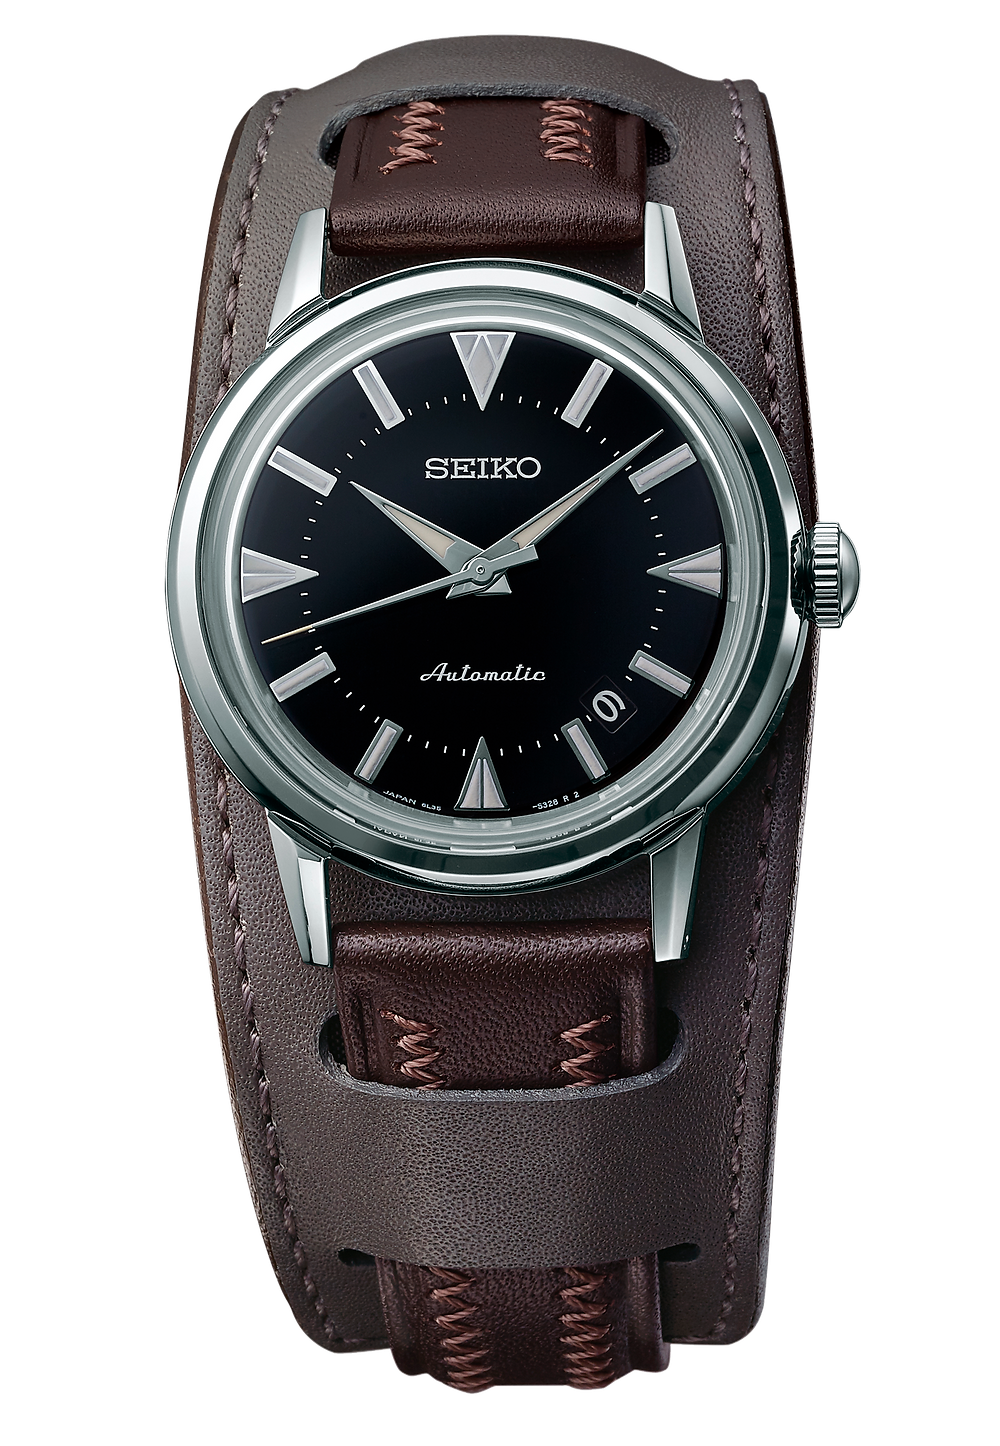 Seiko Prospex Alpinist SJE085 reedicion 2021 limitada 1959 unidades